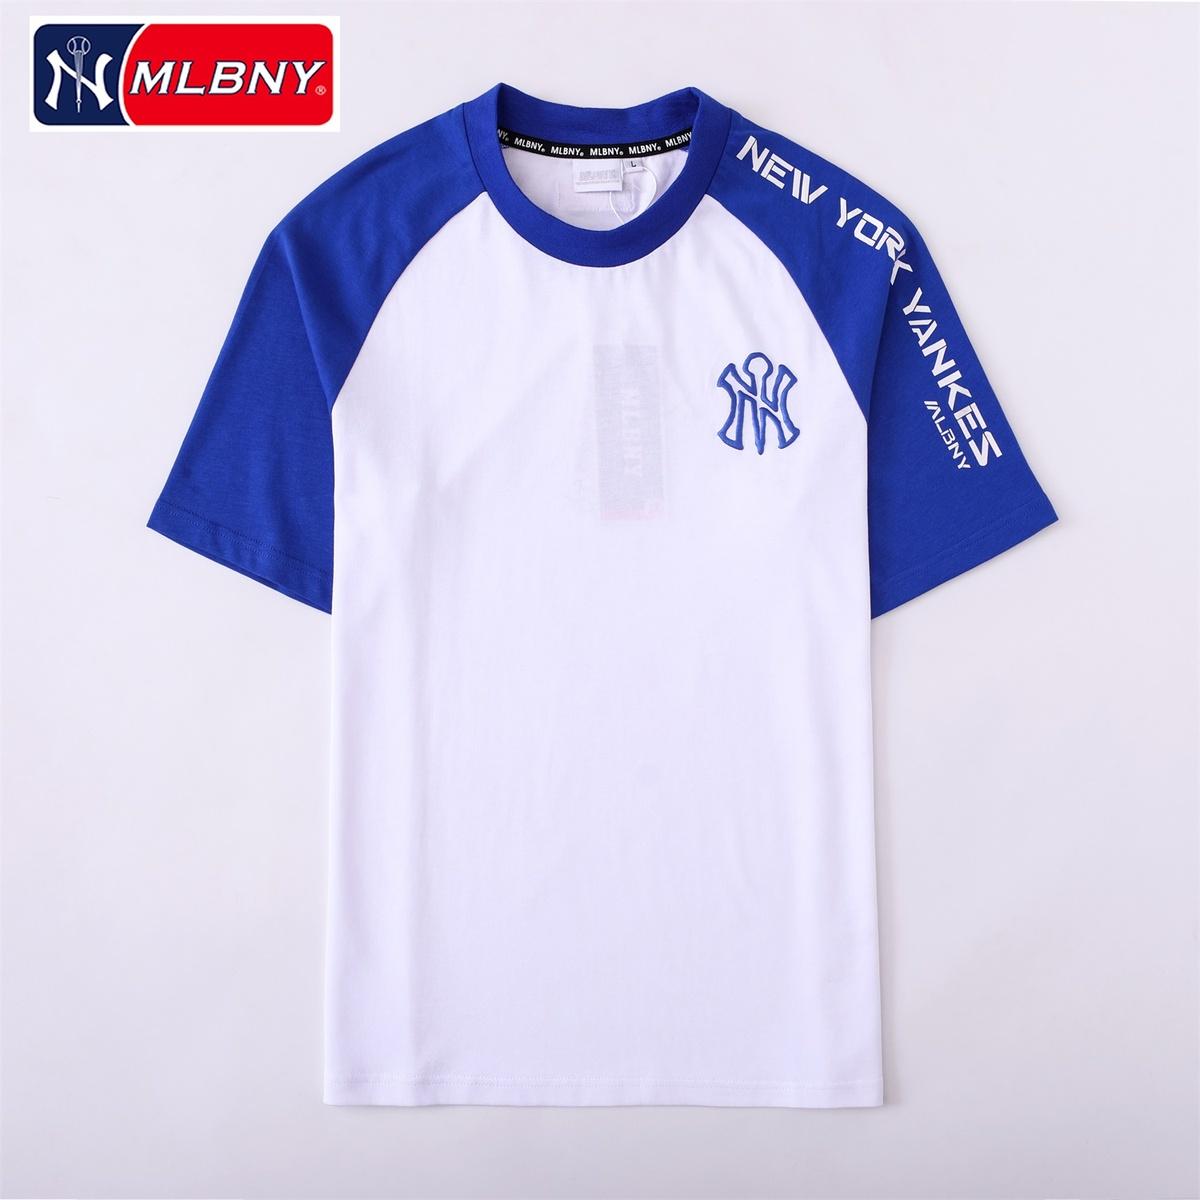 T恤男女宽松学生ins潮纯棉半袖体桖MLB NY上衣原创印花短袖打底衫包邮